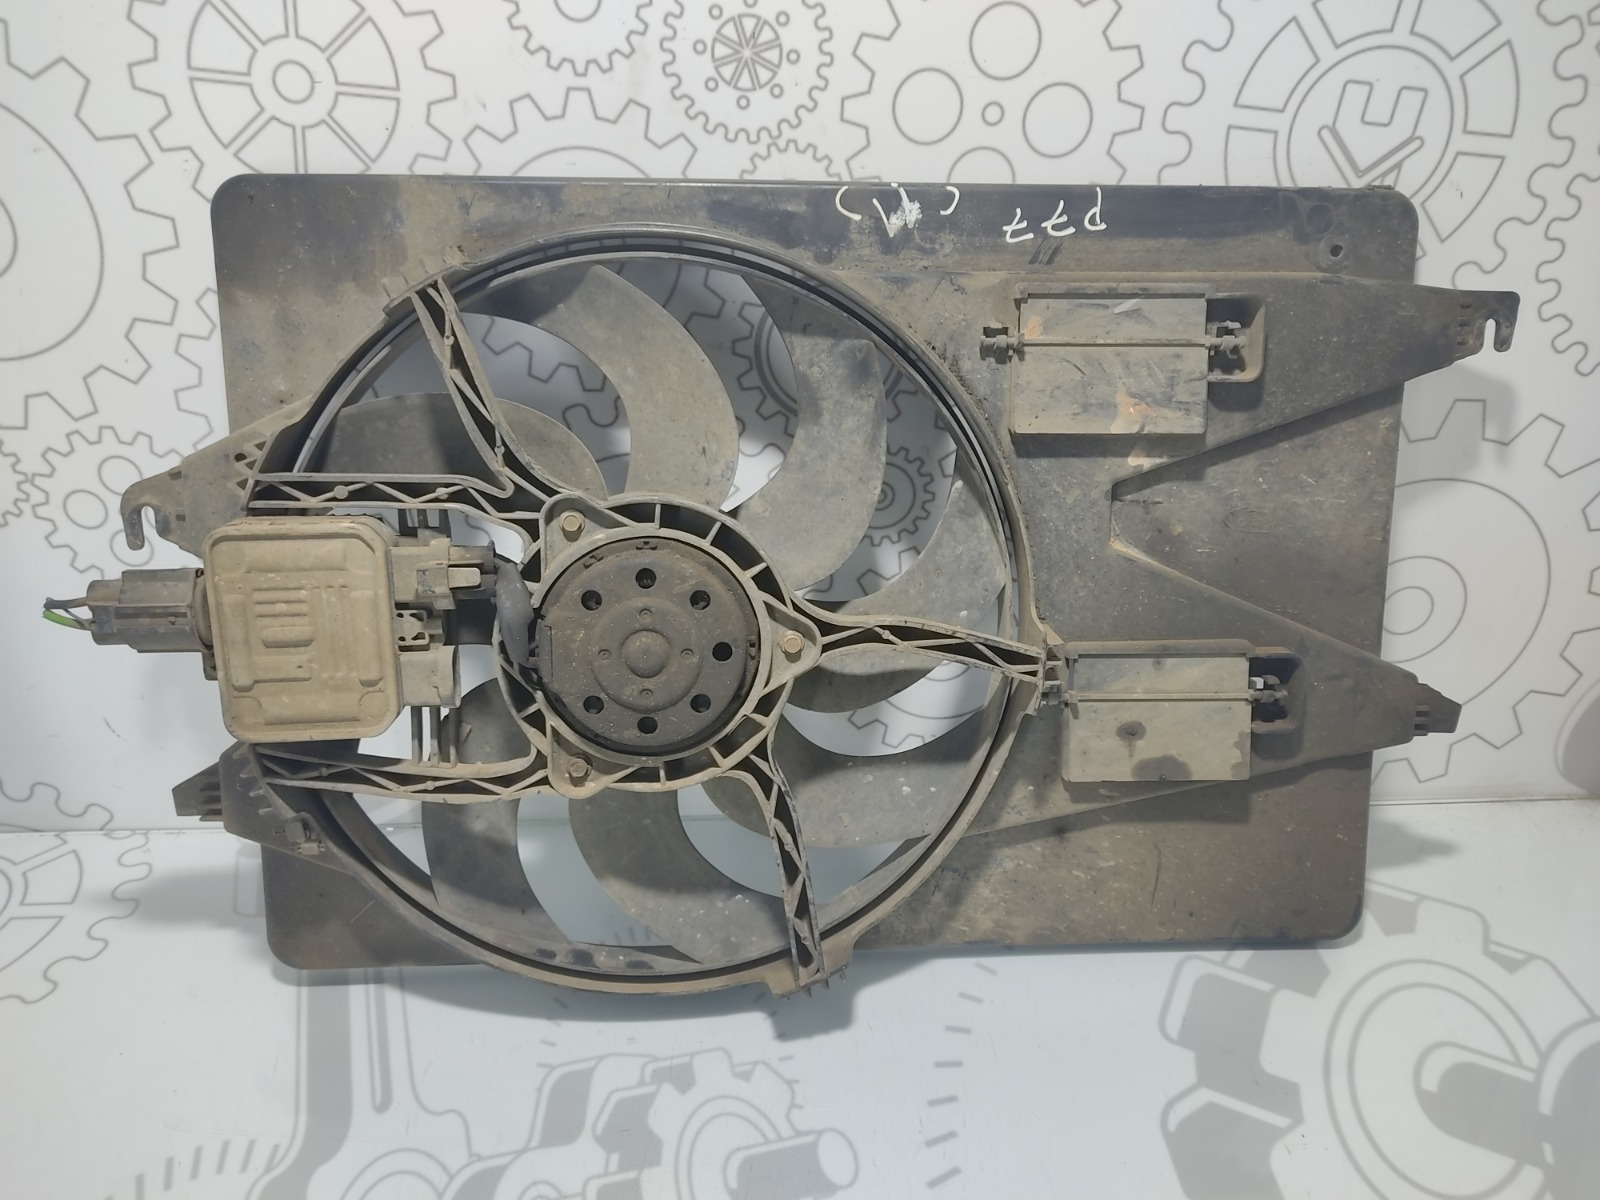 Вентилятор радиатора Ford Mondeo 2.0 TDCI 2006 (б/у)